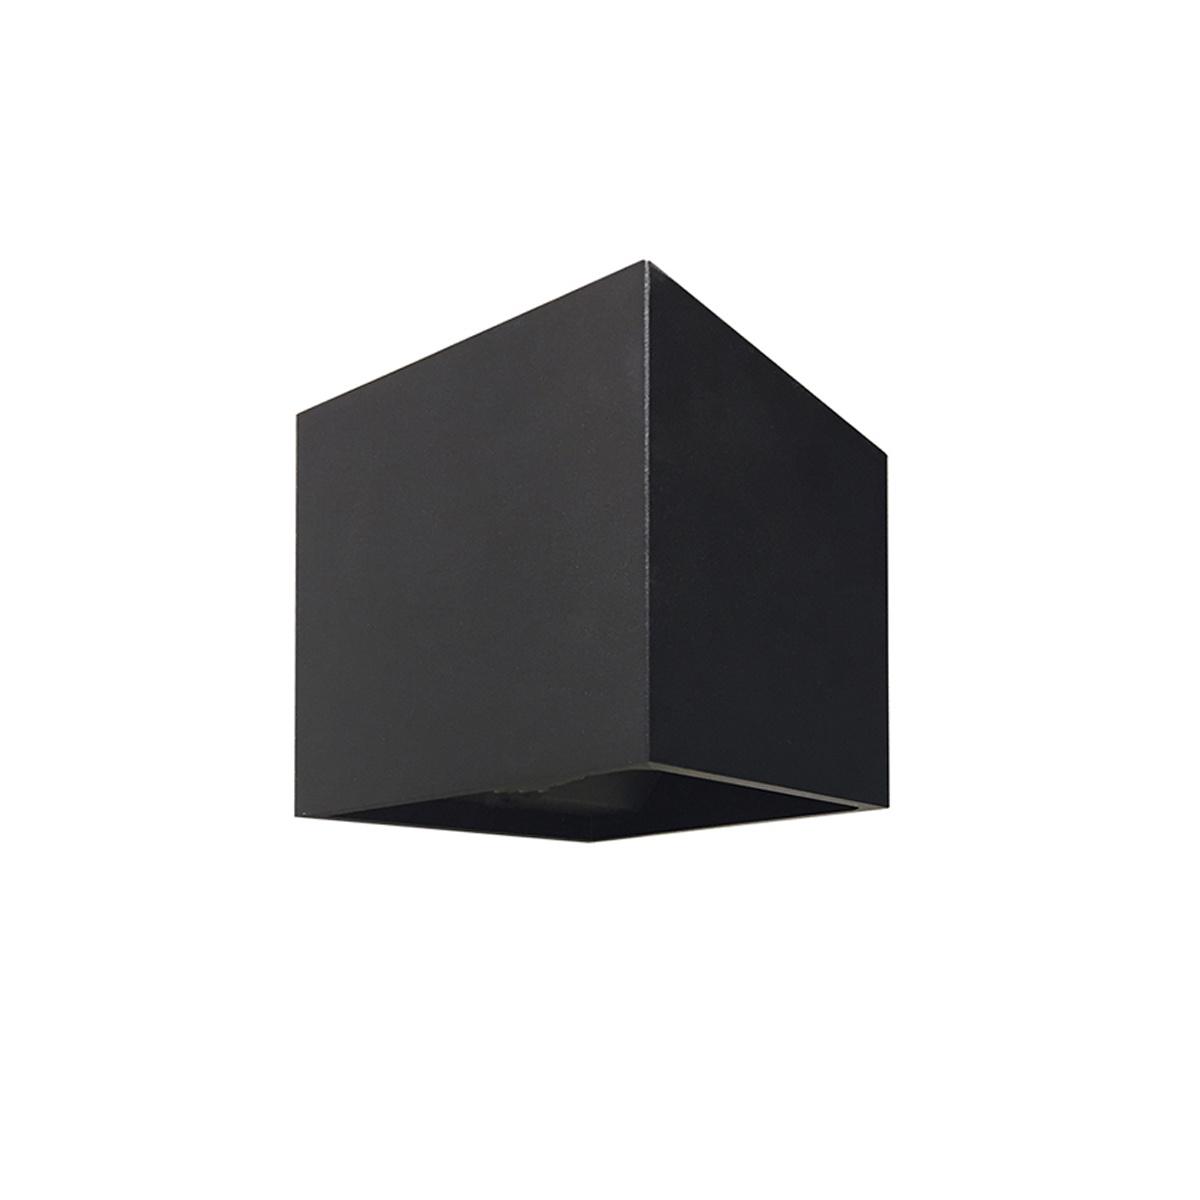 Block S-1